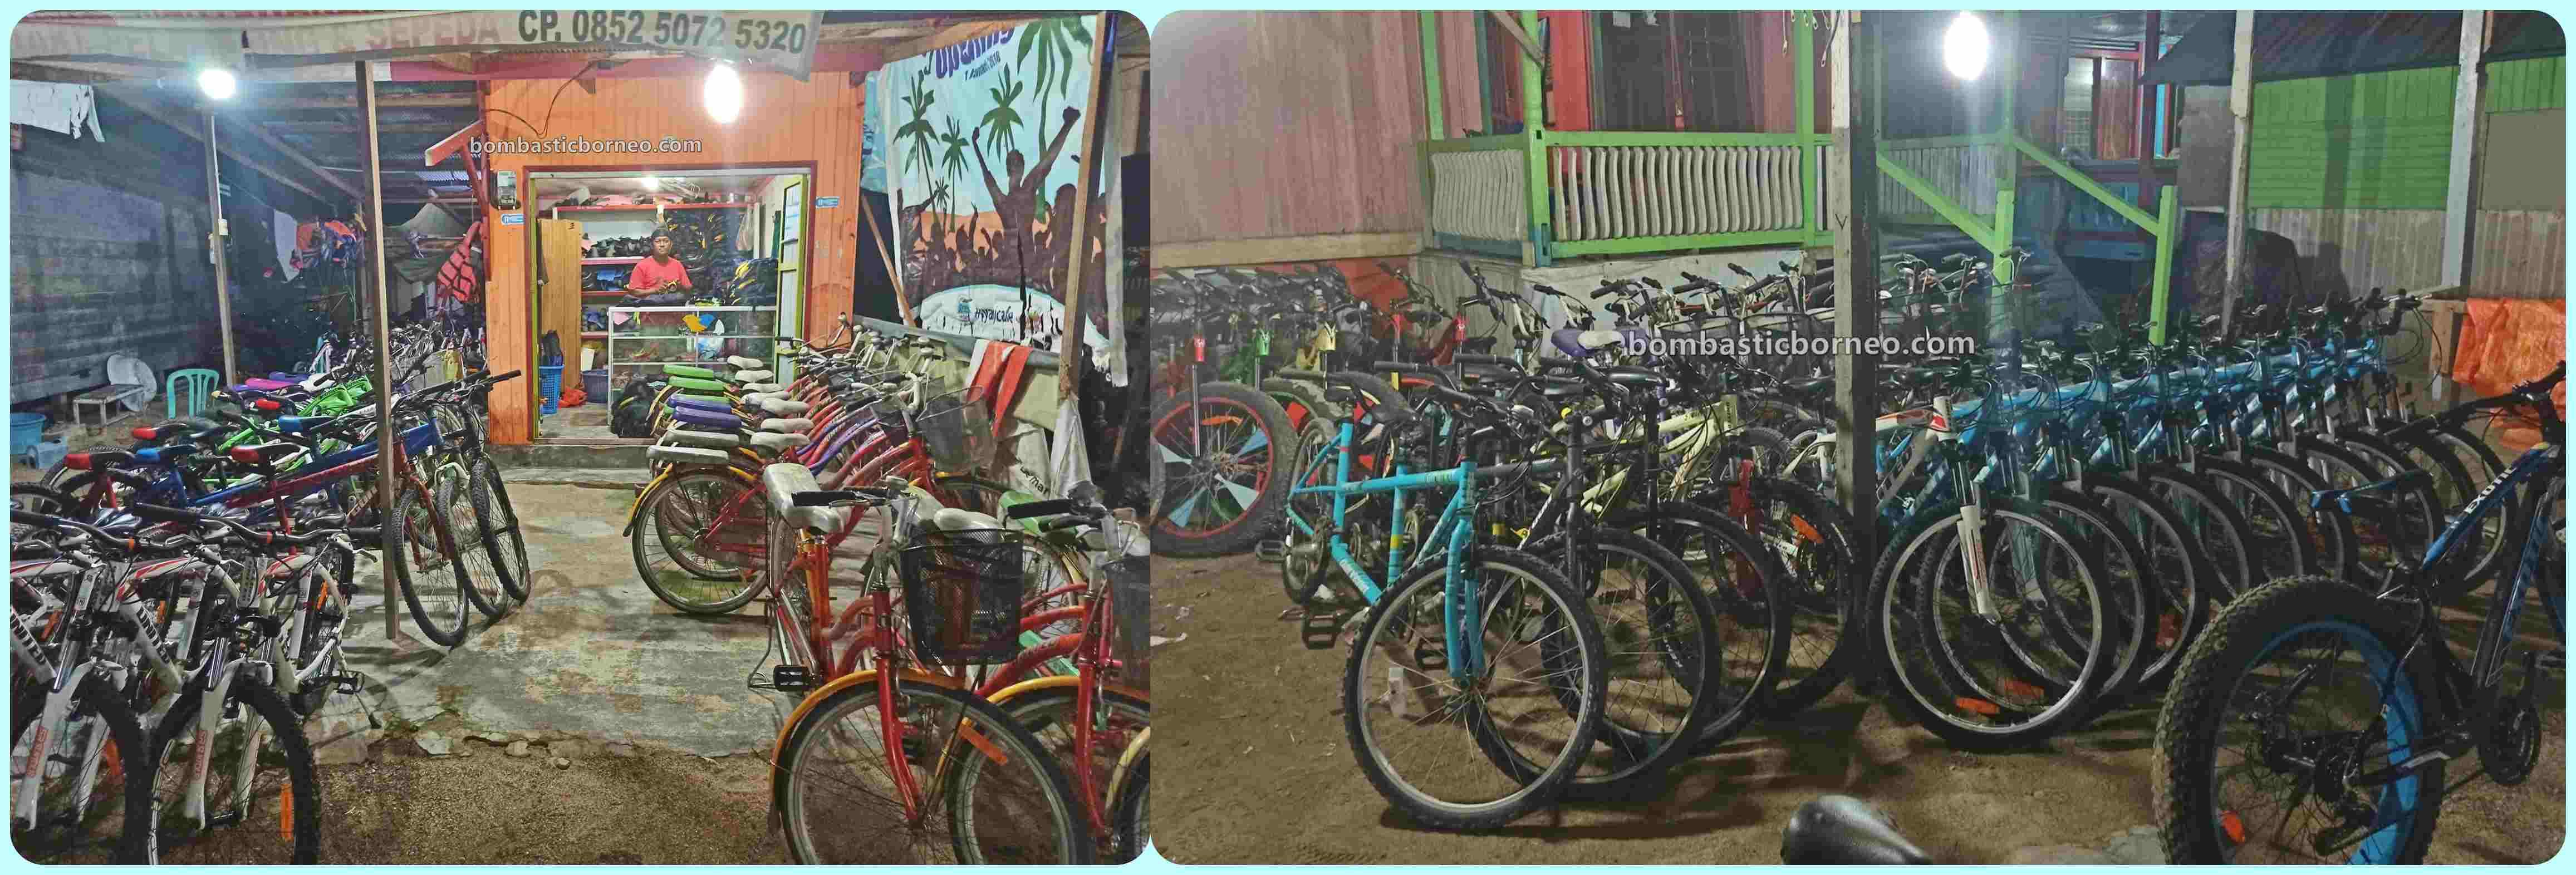 adventure, backpackers, exploration, Bajau village, Derawan Archipelago, Kalimantan Timur, objek wisata, Pariwisata, Tourism, tourist attraction, 跨境婆罗洲印尼, 东加里曼丹达拉湾岛